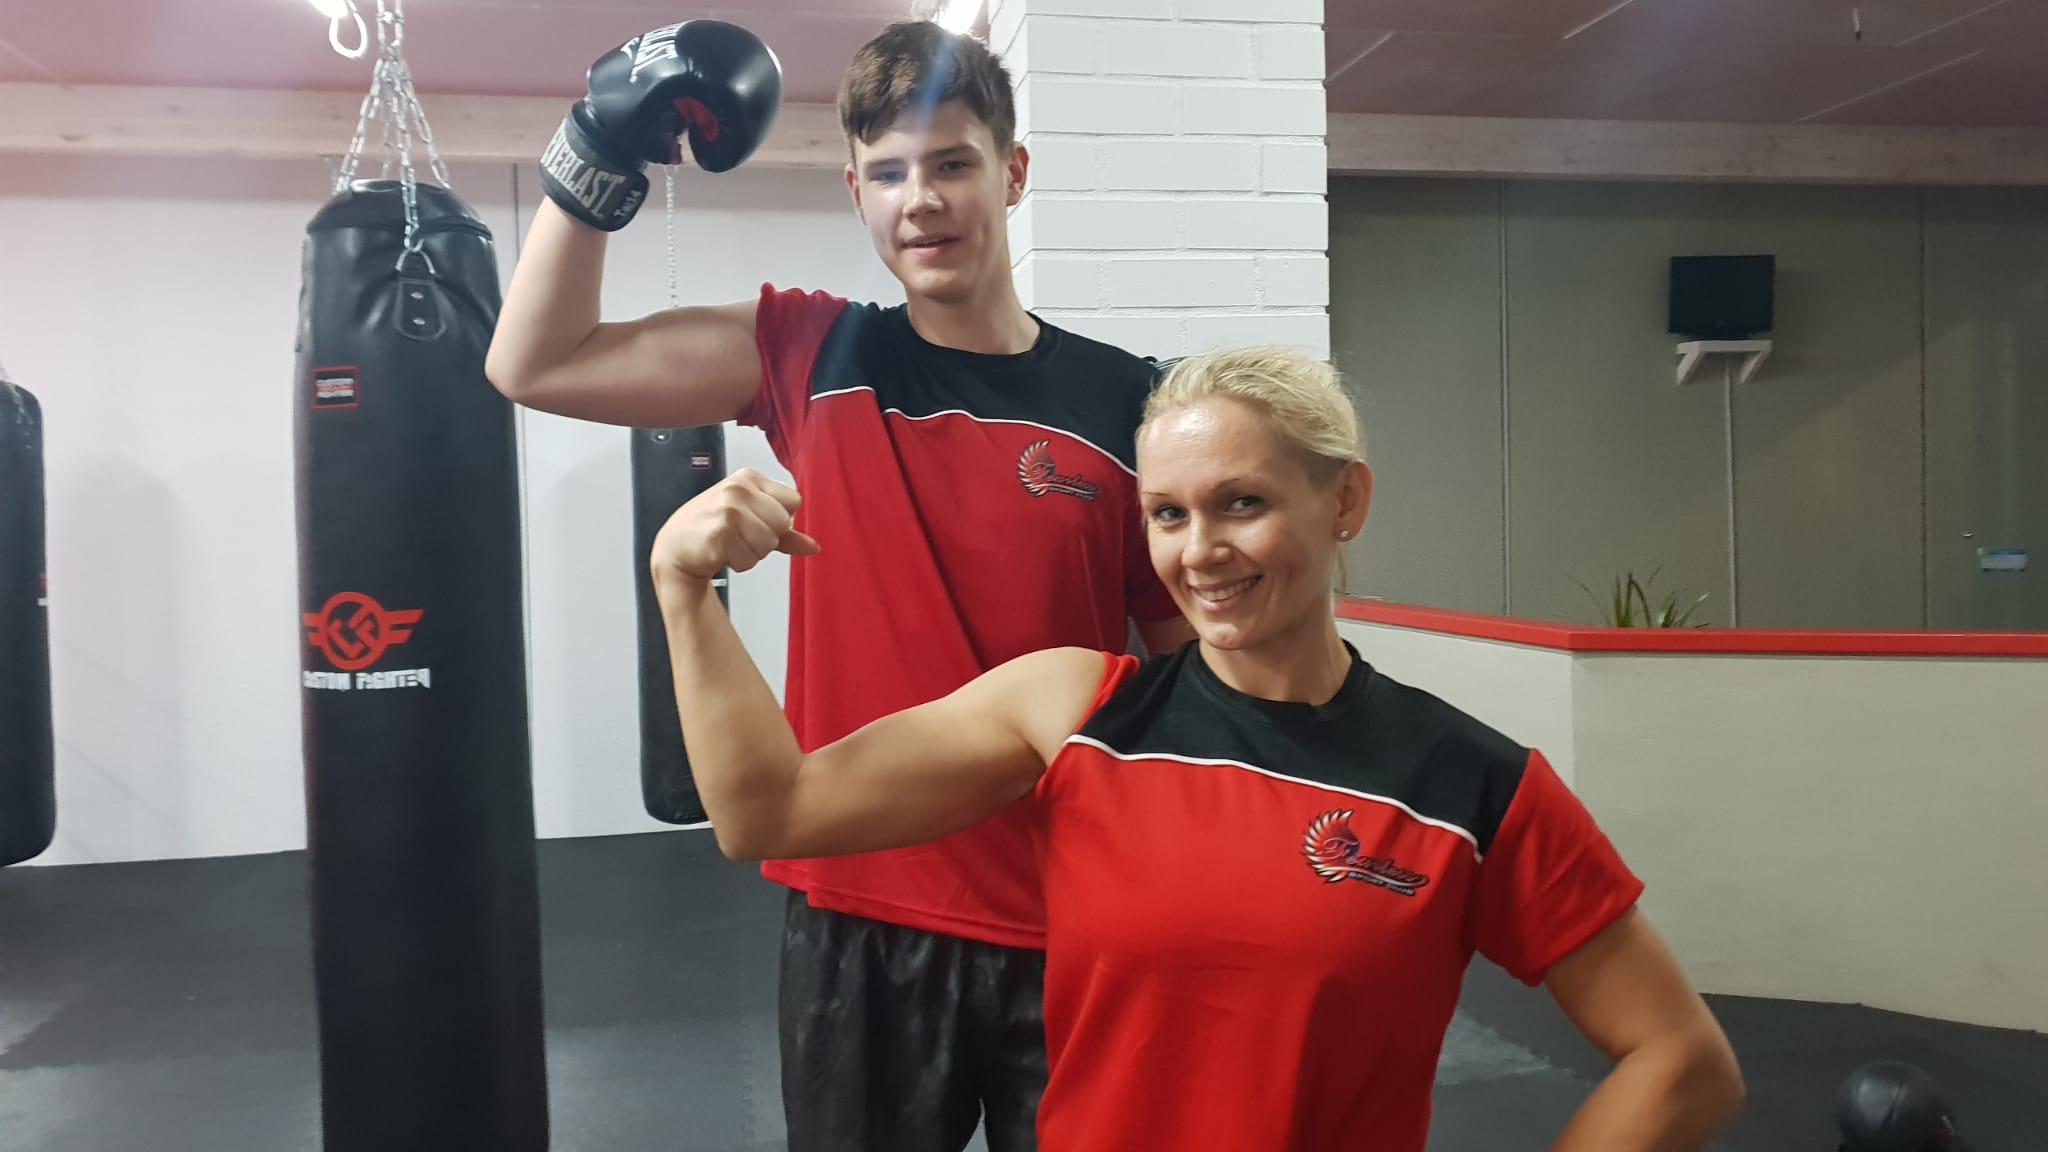 boxeo femenino boxeo masculino vilanova i la geltru